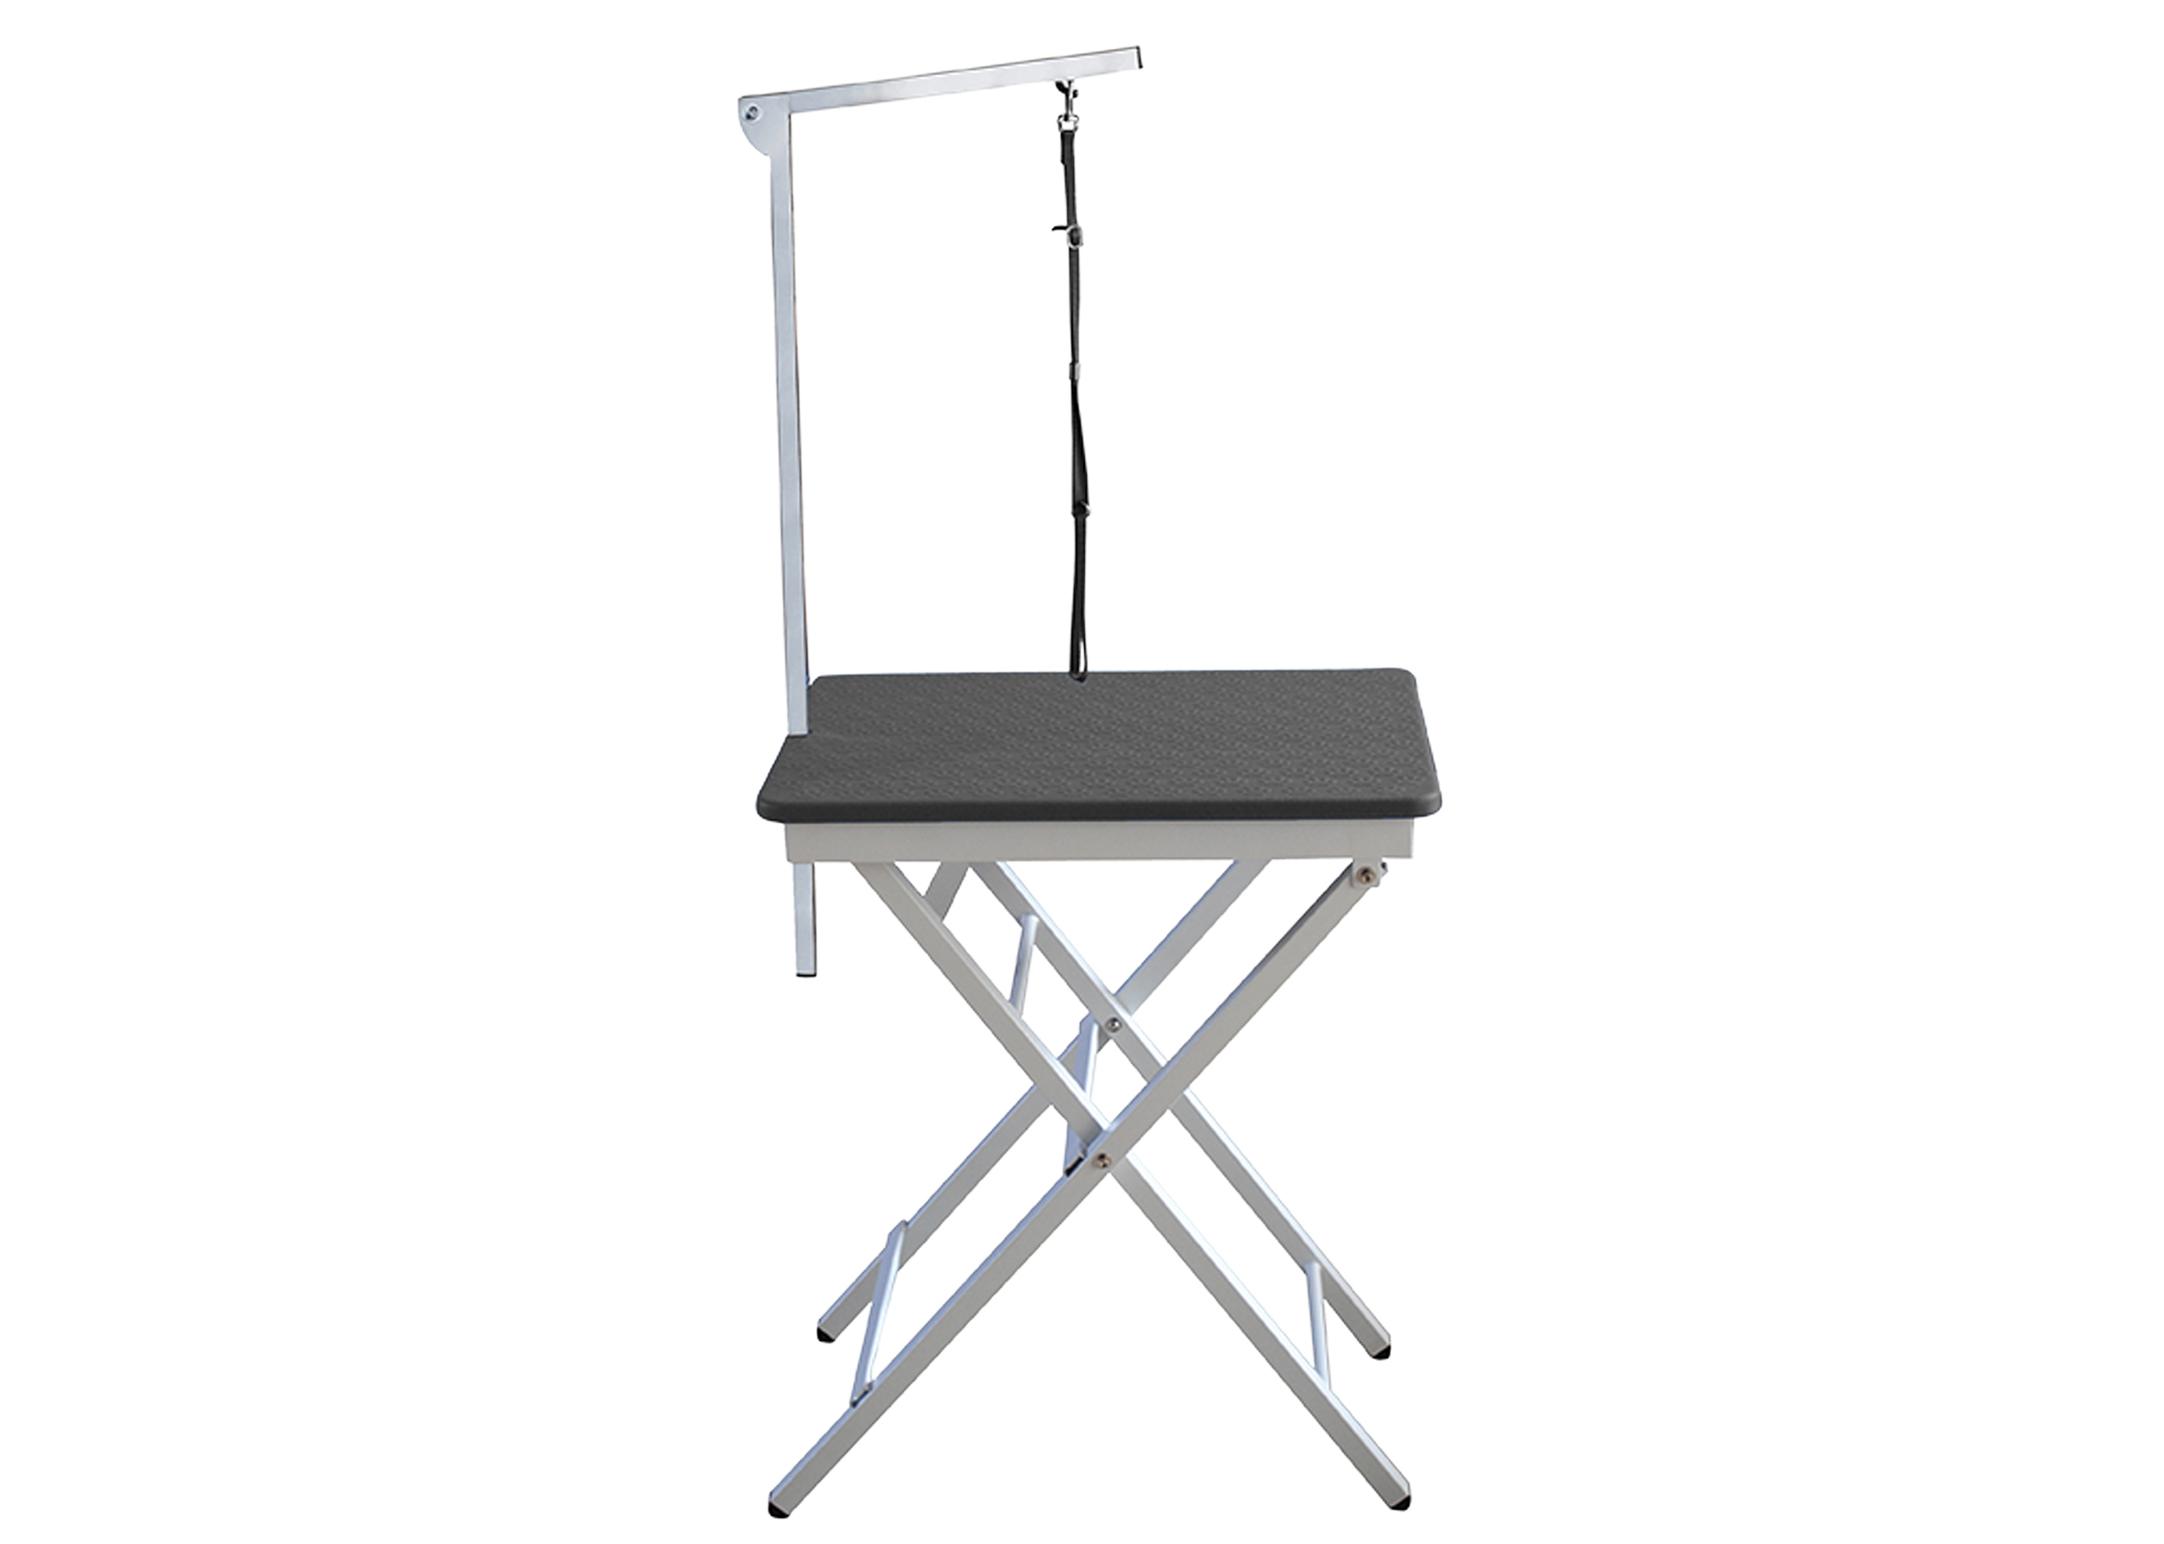 Groom-X Ringside Table 60x45x73-82cm Show Table